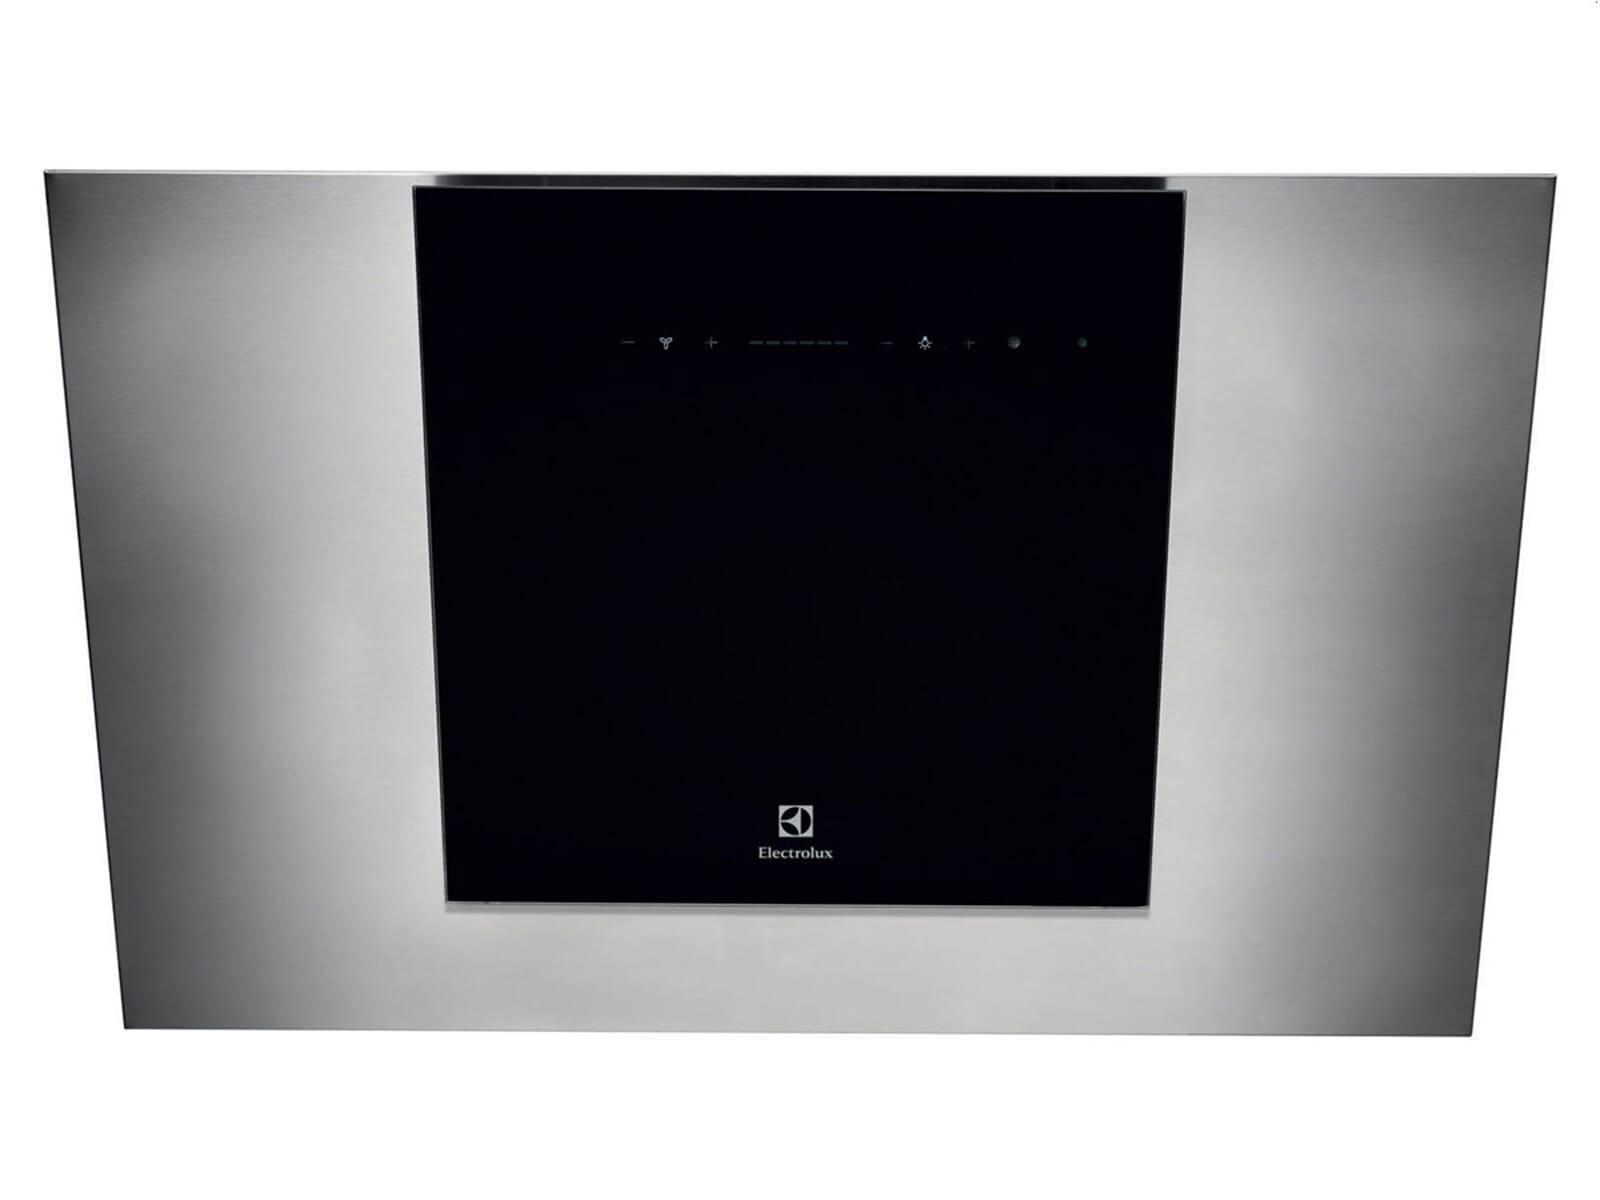 aeg electrolux eff80680bx kopffrei wand dunstabzugshaube edelstahl schwarz 80cm ebay. Black Bedroom Furniture Sets. Home Design Ideas